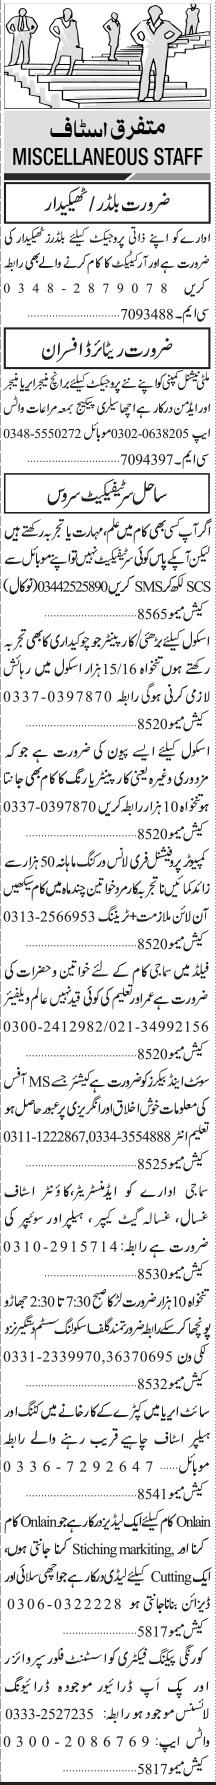 Daily Jang Newspaper Sunday Classified Jobs Feb 2021 in Karachi